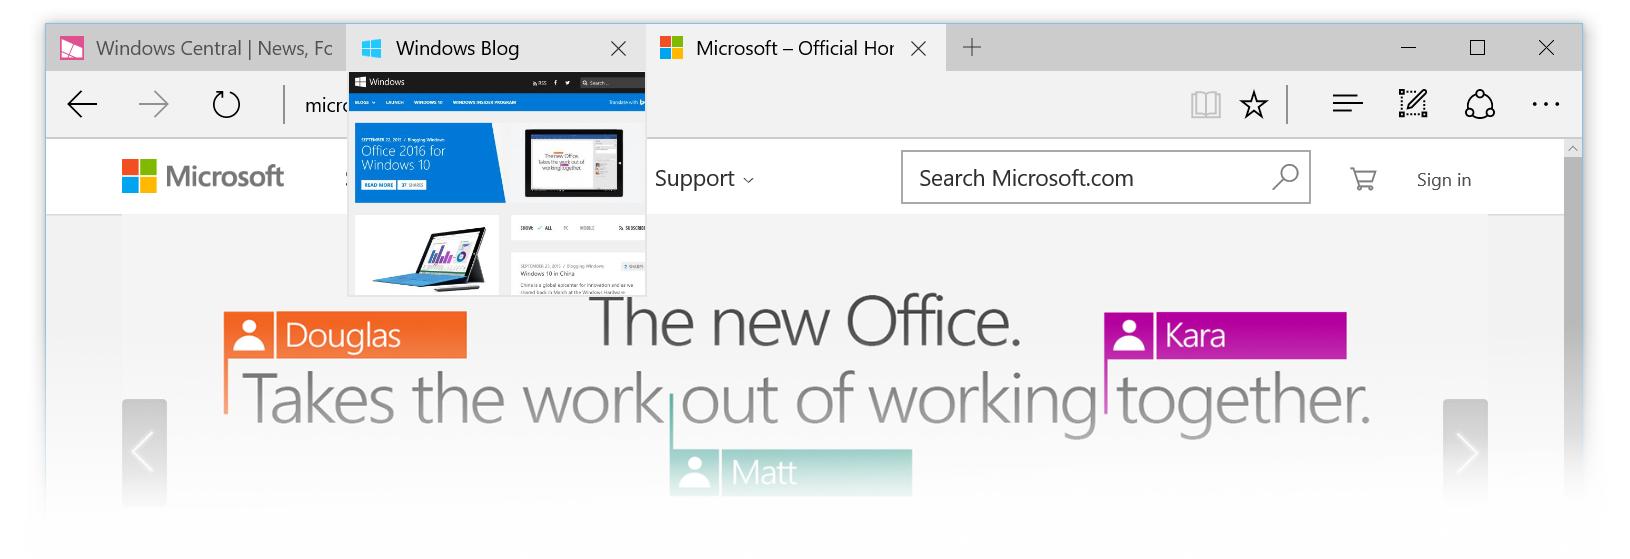 Сборка 10565 для ПК доступна инсайдерам Windows - 2